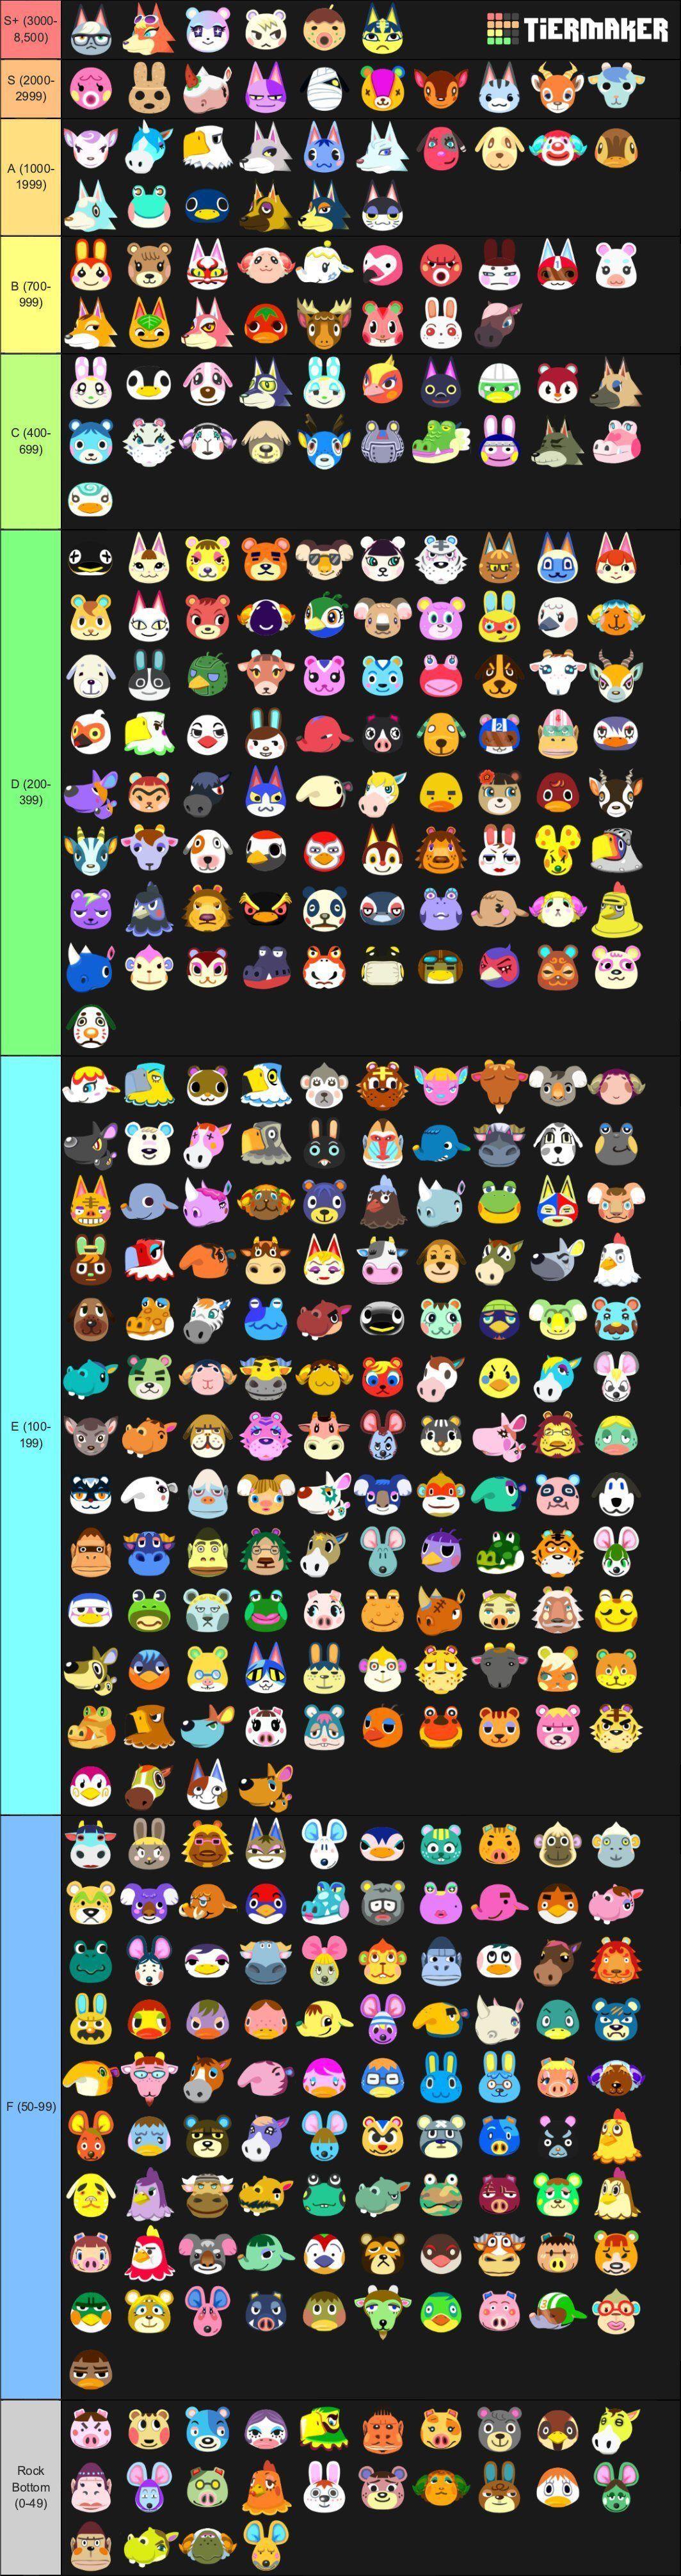 Pin By Elizabeth Rains On Animal Crossing In 2020 Animal Crossing Villagers Animal Crossing Animal Crossing Funny